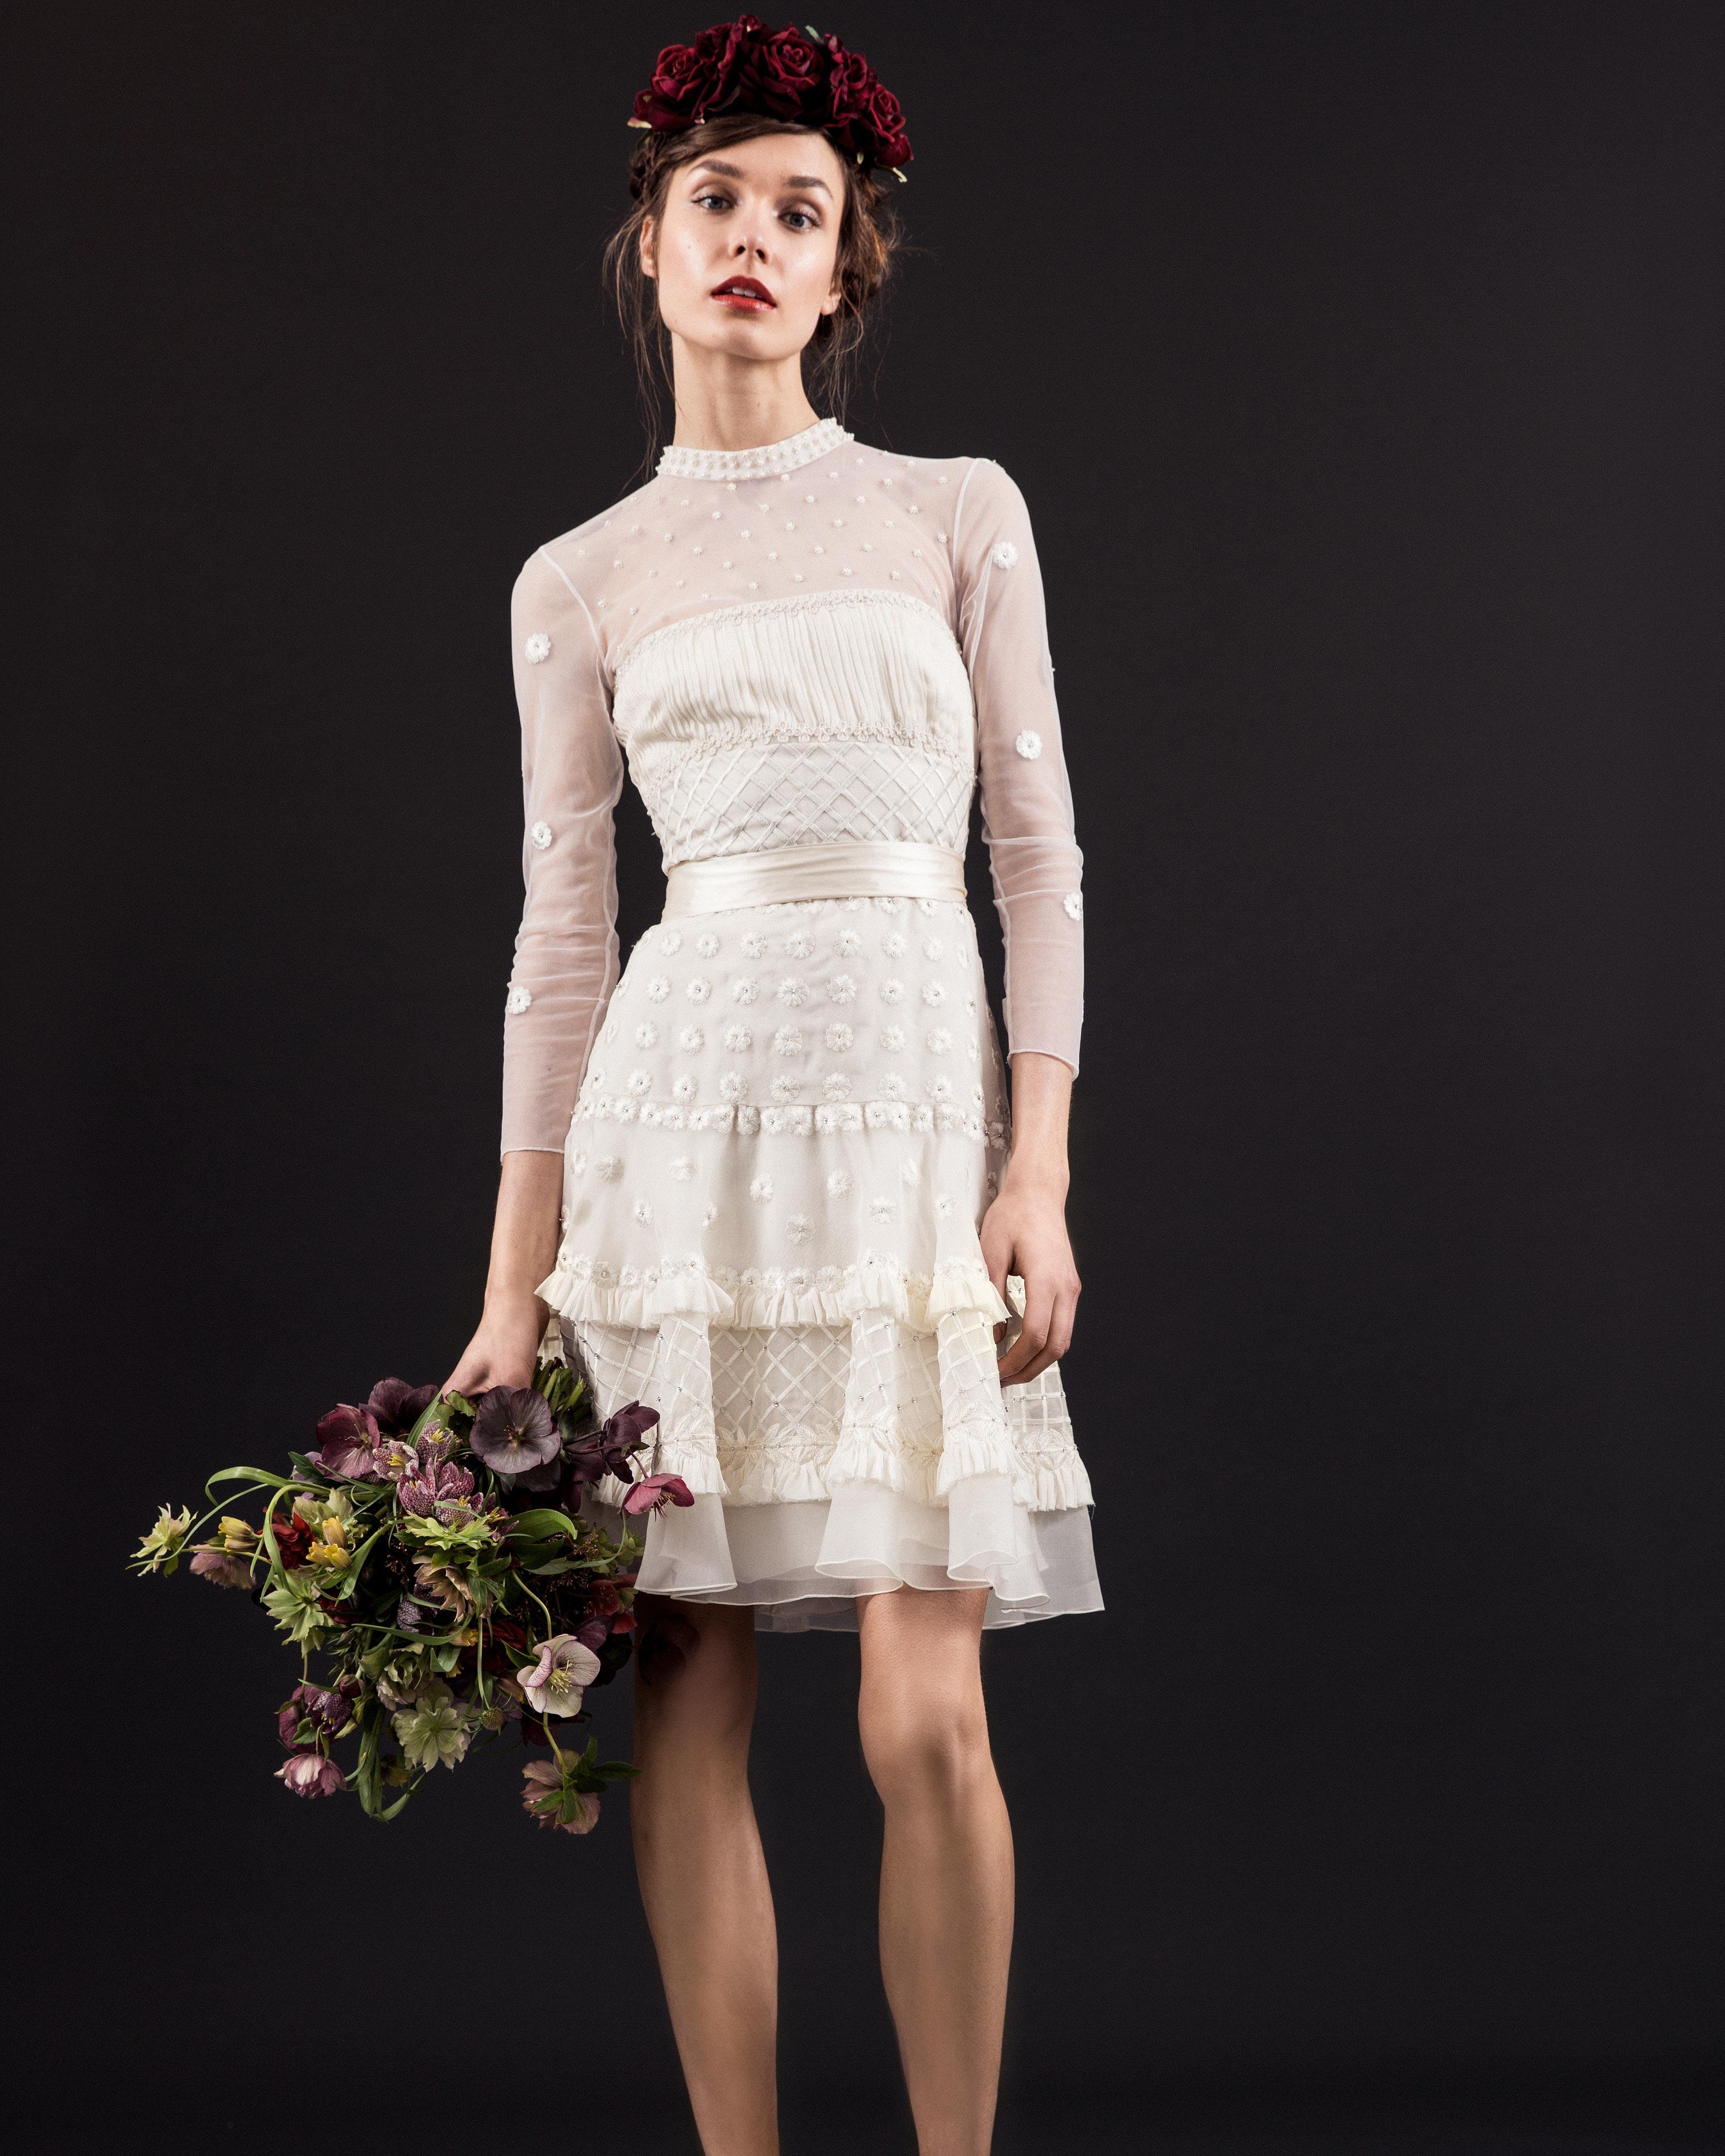 temperley-london-evie-dress-bridal-market-ss17-0416.jpg